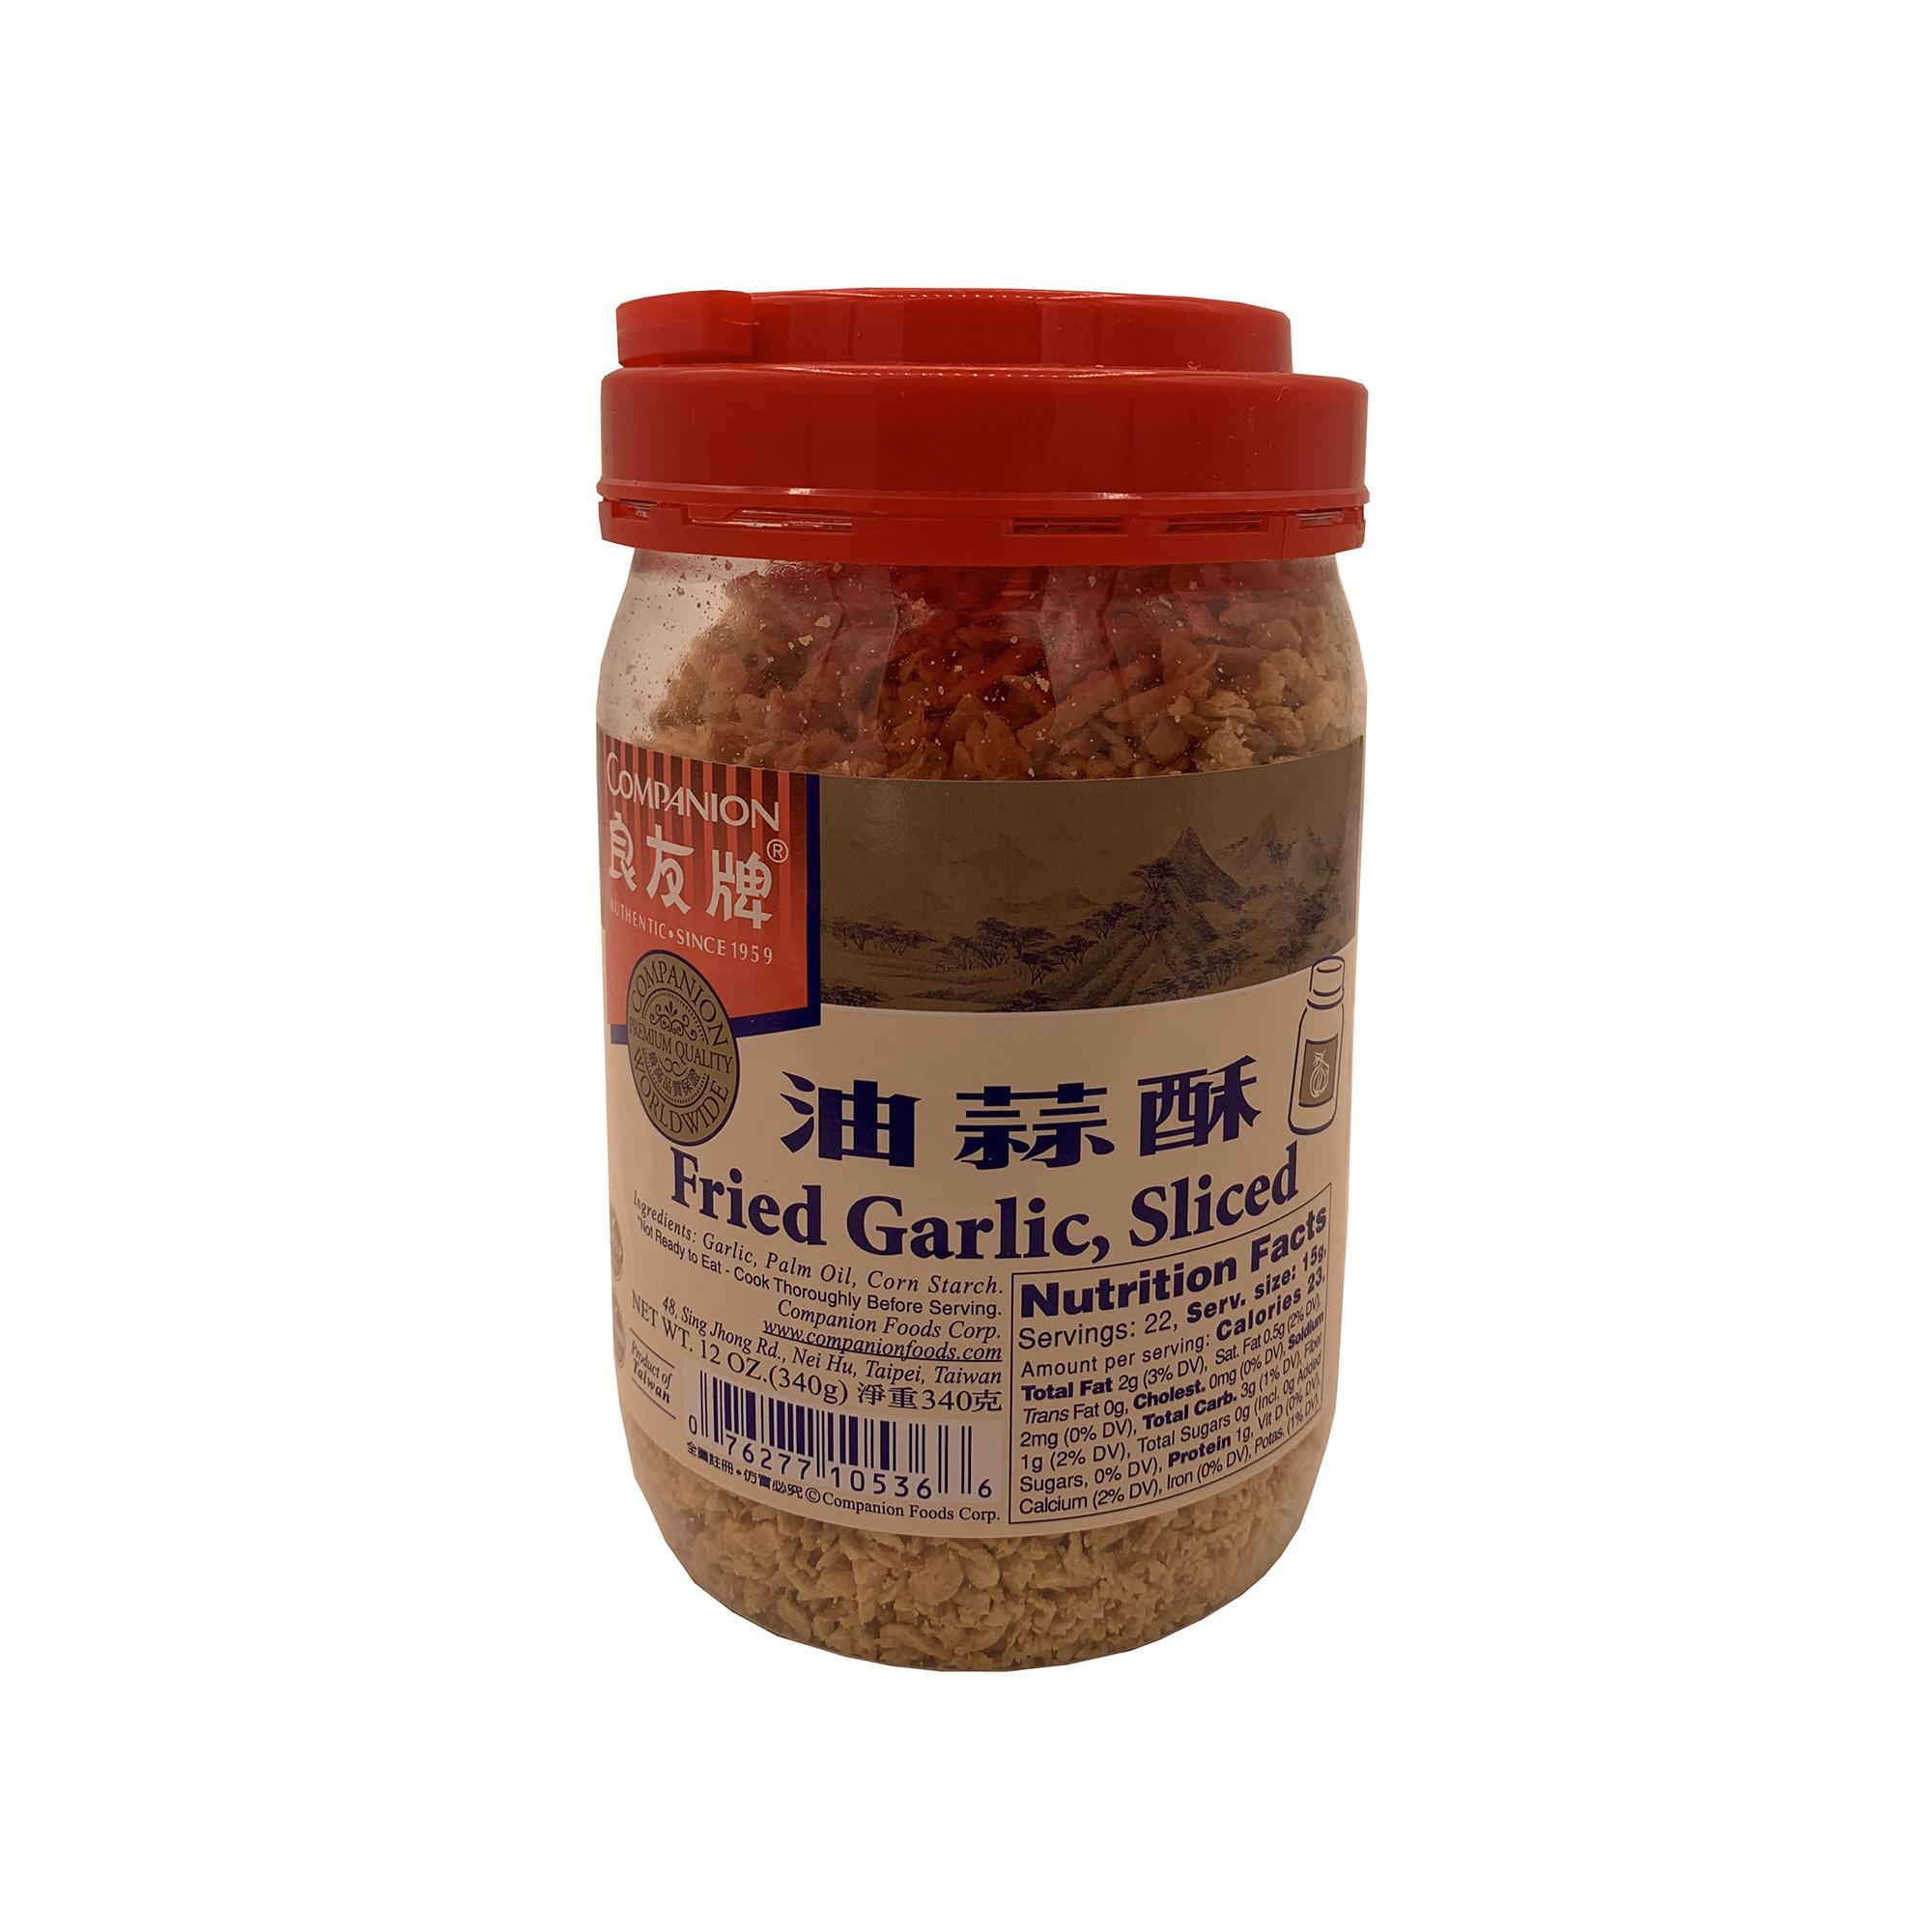 COMPANION Fried Garlic, Sliced 12 OZ